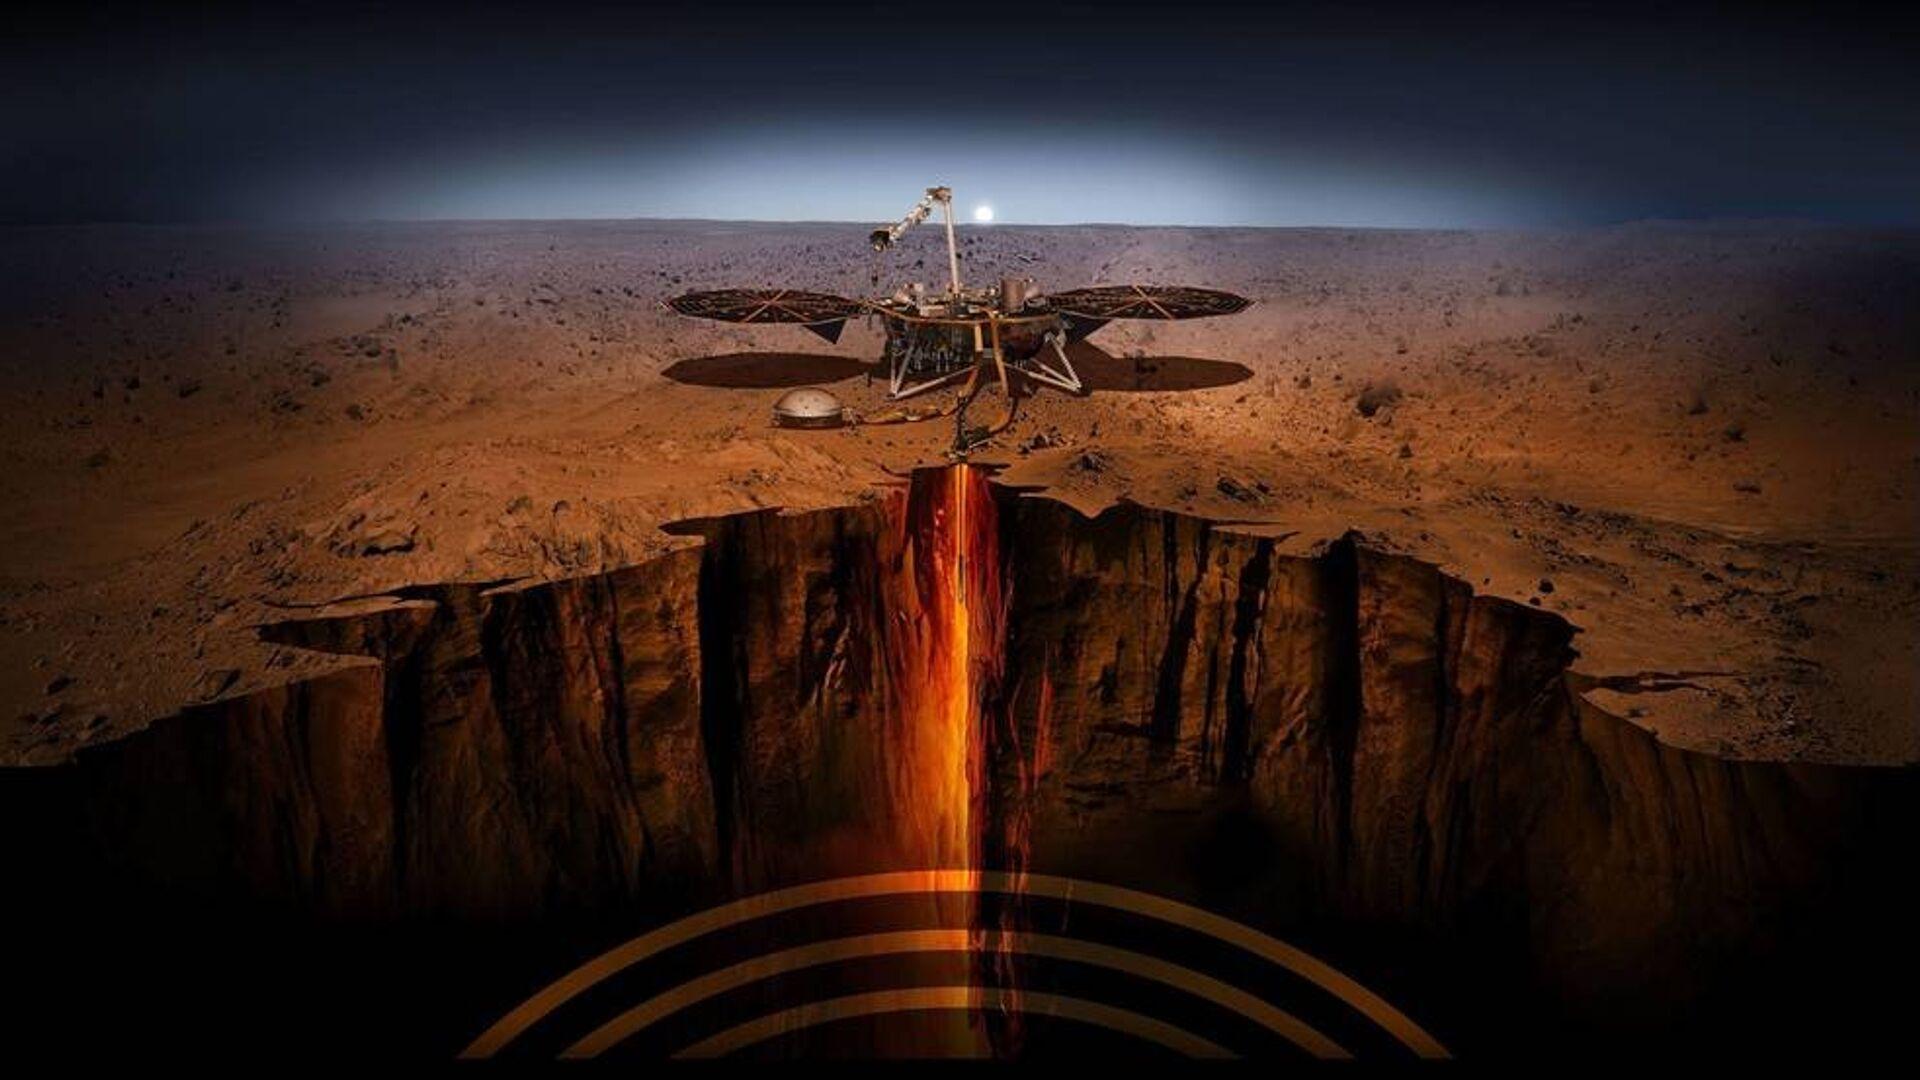 Иллюстрация спускаемого модуля InSight на Марсе - РИА Новости, 1920, 27.06.2021